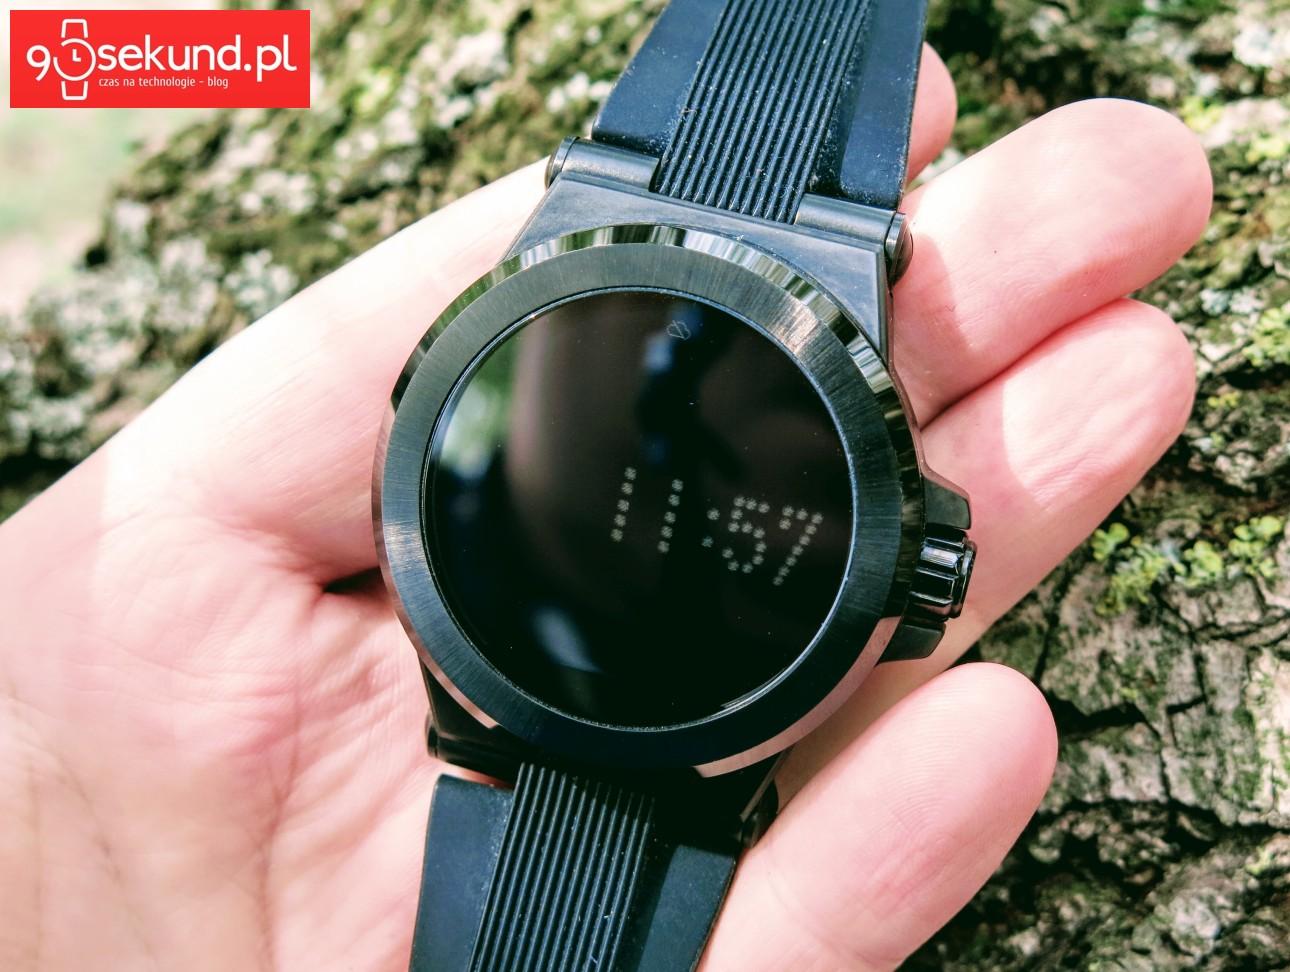 b7a32778b791b Recenzja smartwatcha Michael Kors Access (Dylan MKT-5011) – 90sekund.pl